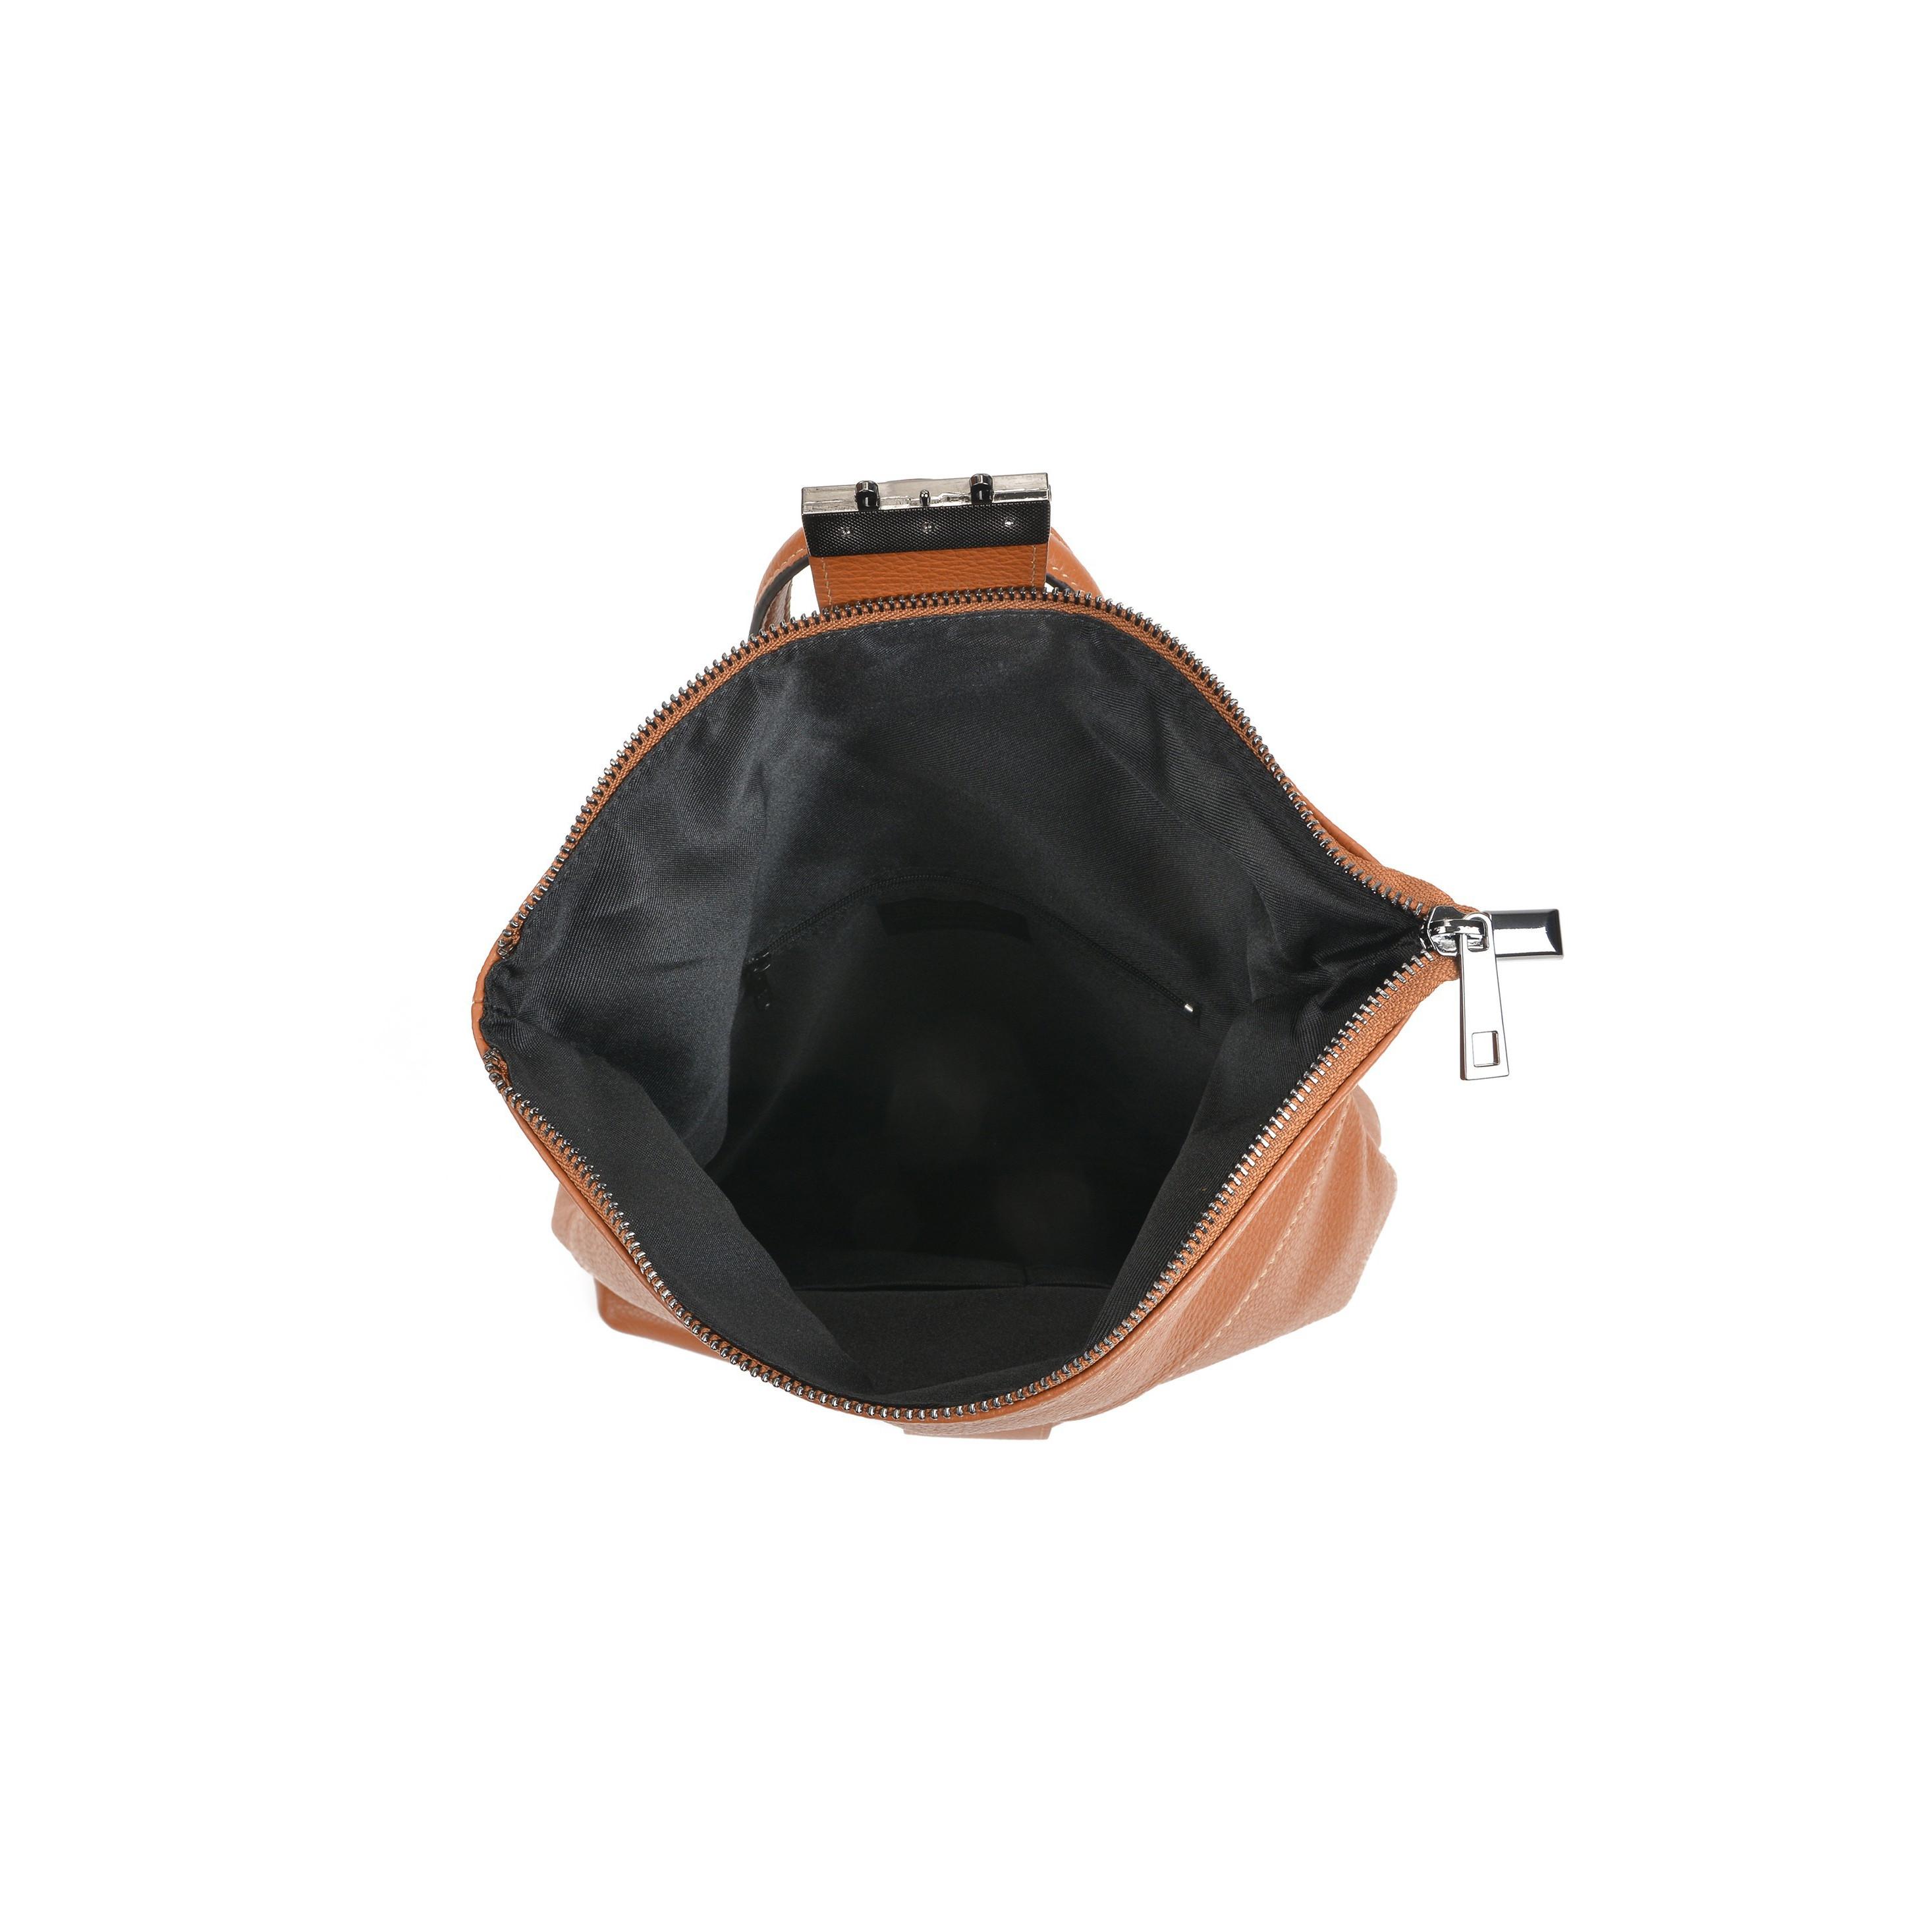 Leder-Rucksack Isabella Rhea | Cognac